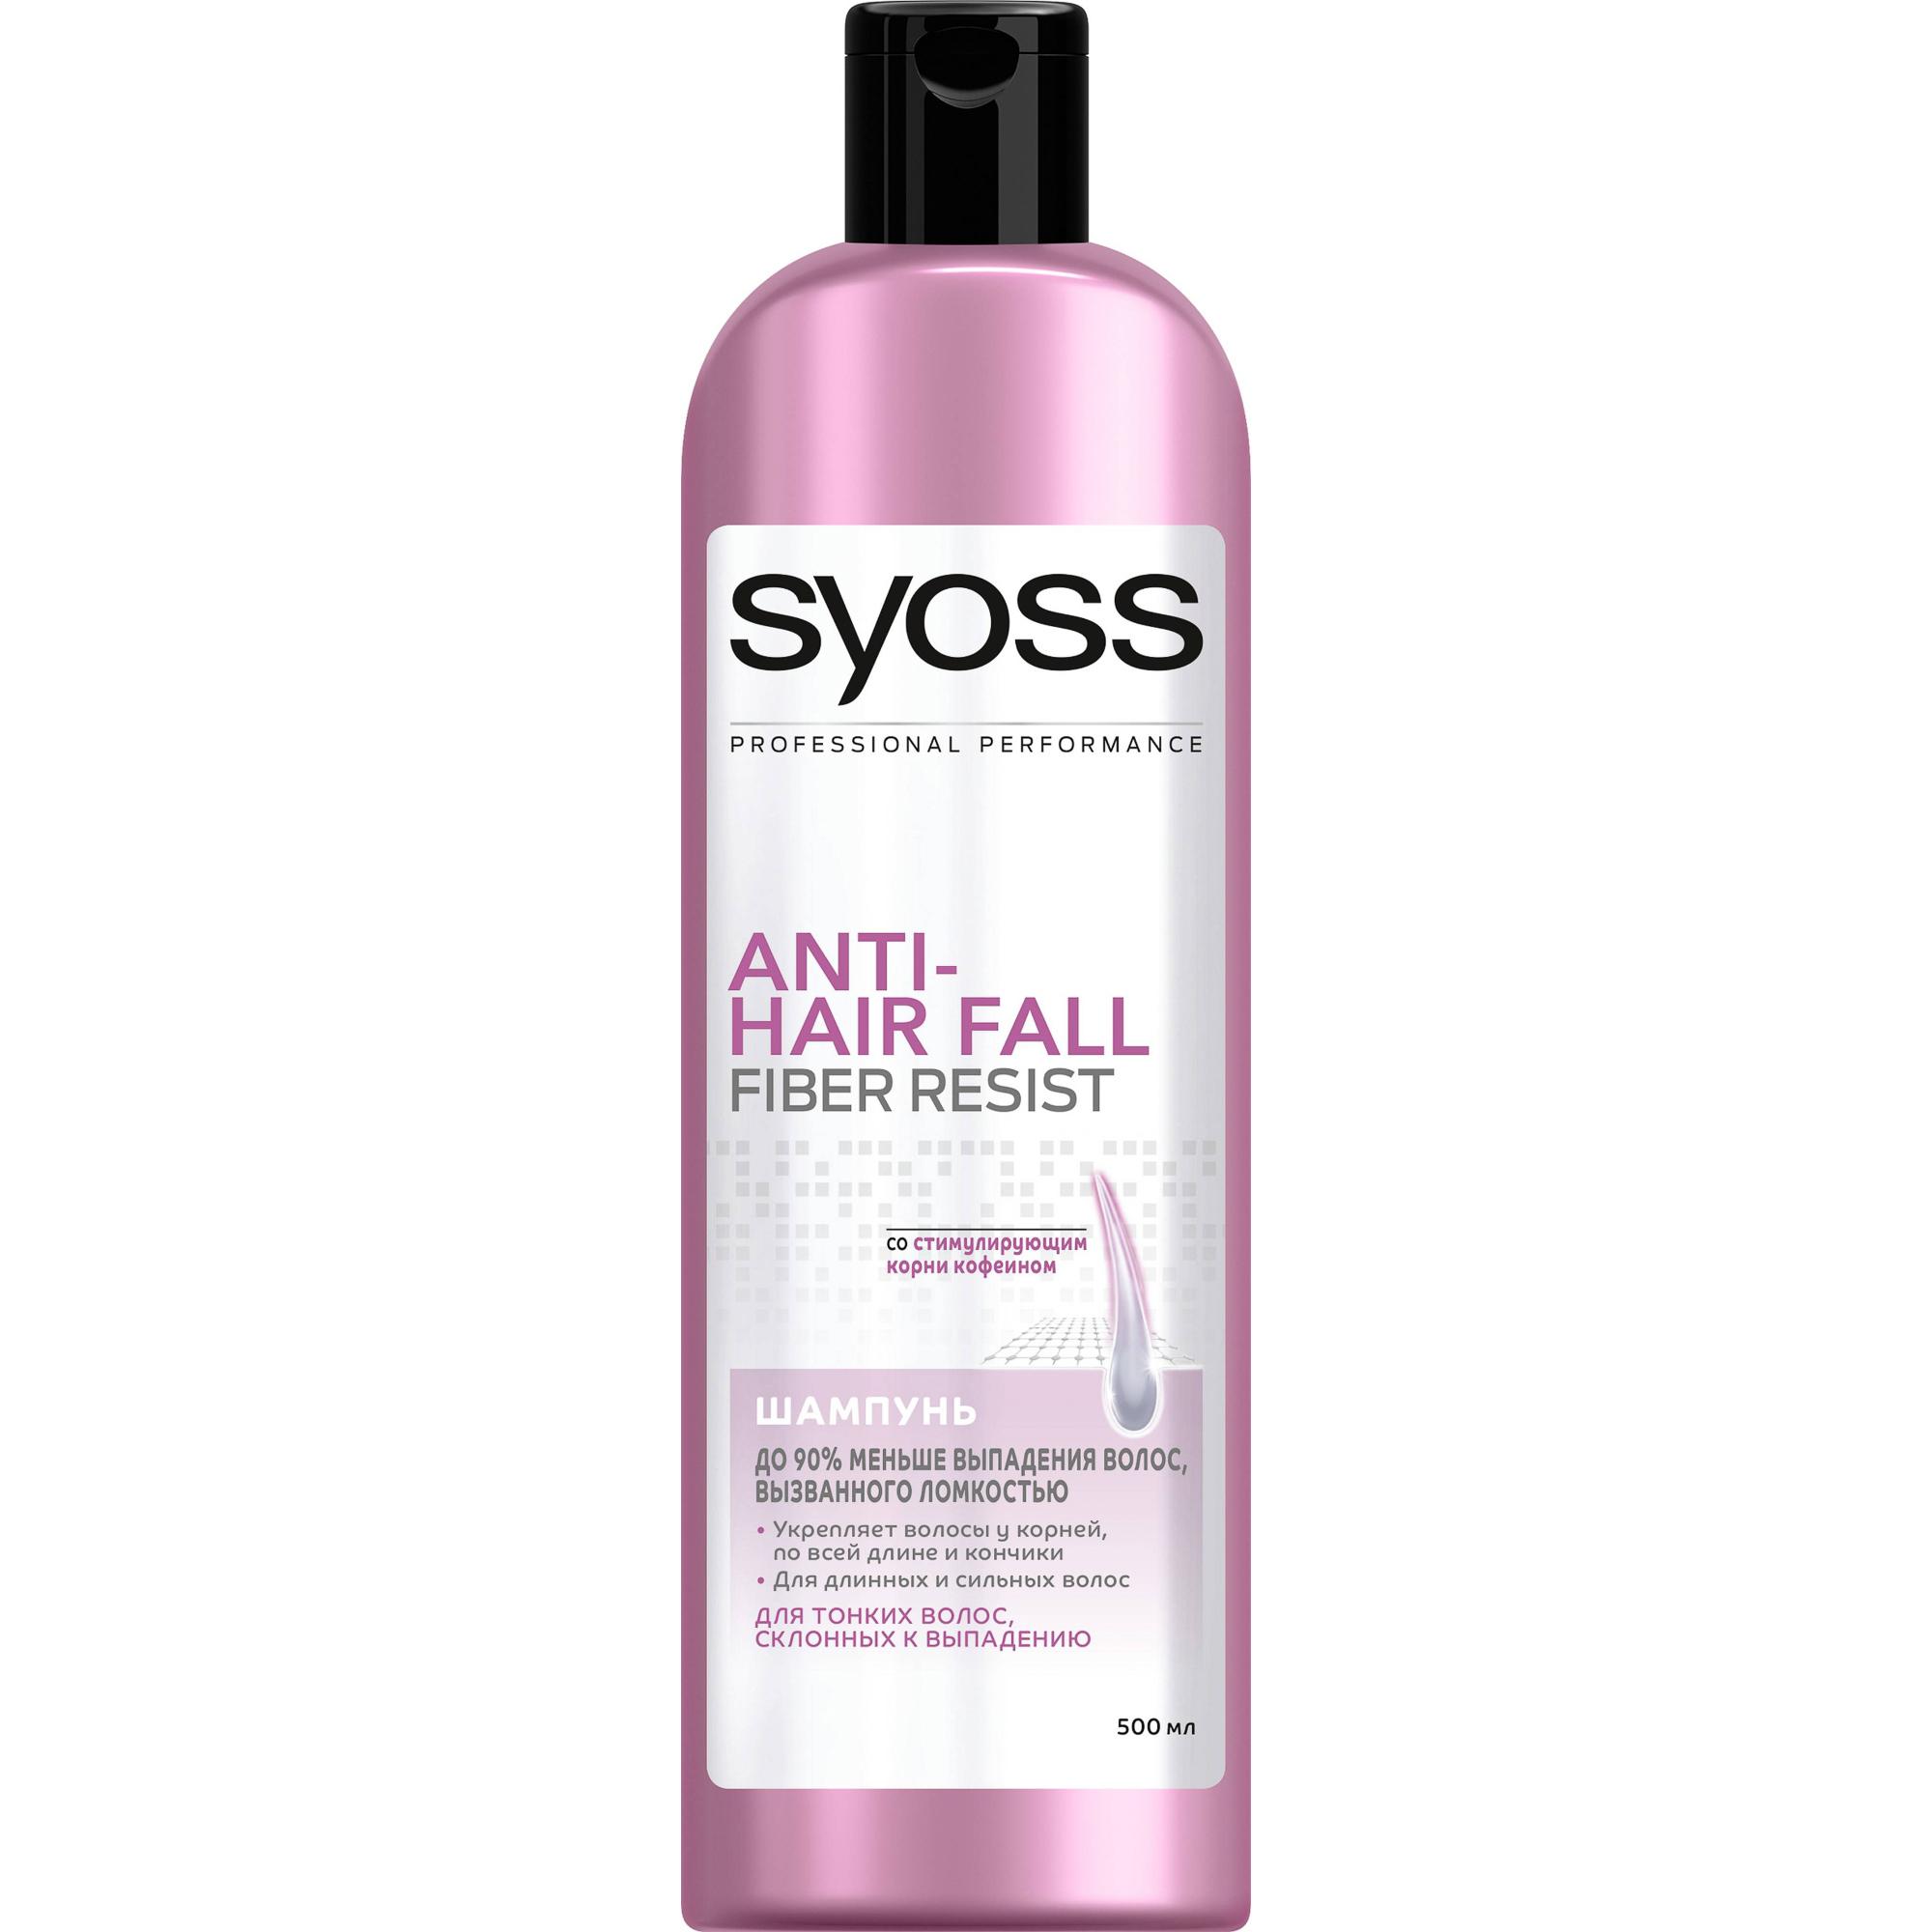 Фото - Шампунь Syoss Anti-Hair Fall 500 мл бальзам syoss anti hair fall fiber resist 95 для склонных к выпадению волос 500 мл